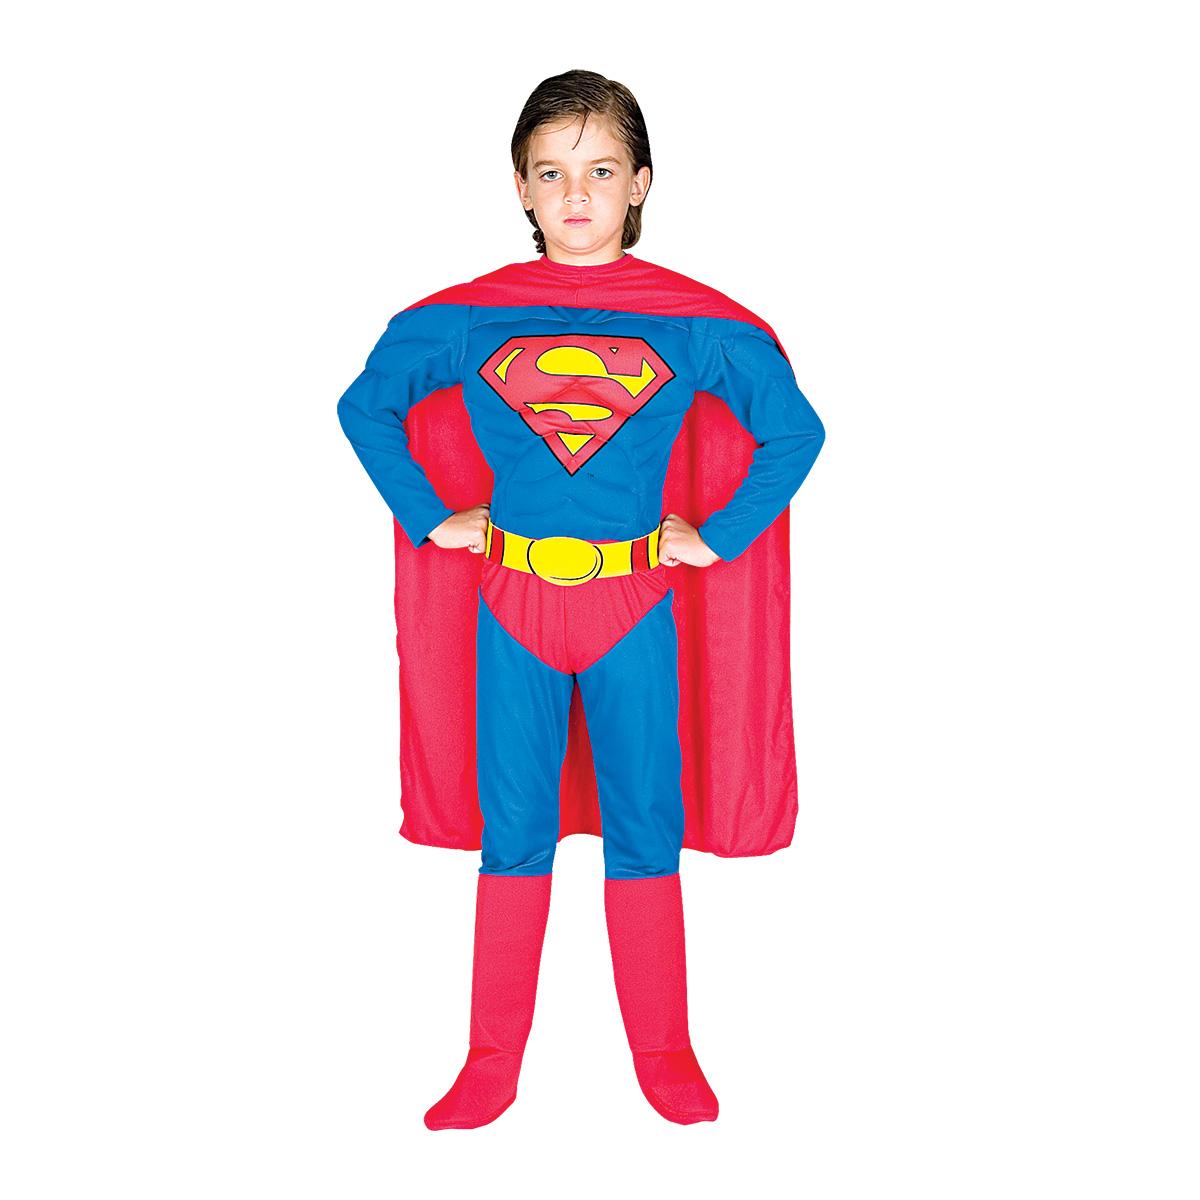 Fantasia Super Homem Luxo cf4852d1b9b